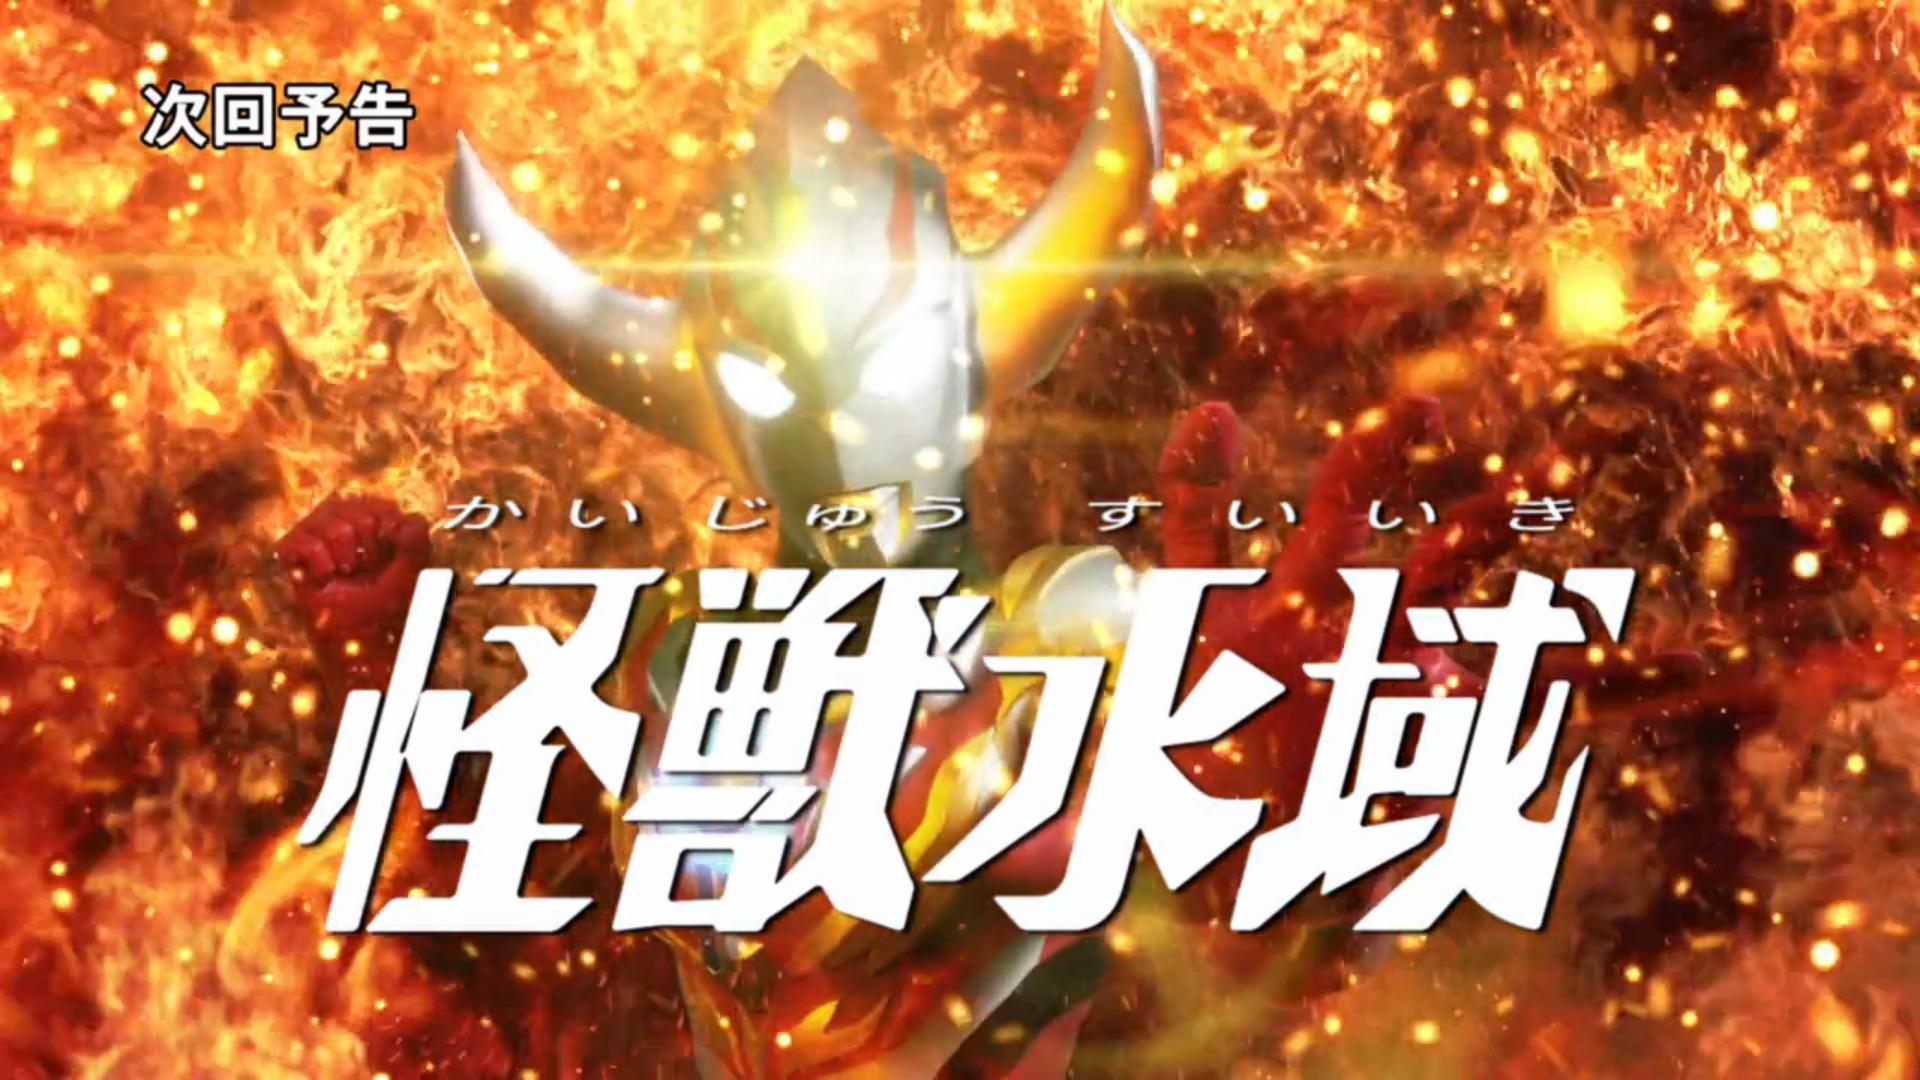 Next Time On Ultraman Orb: Episode 3